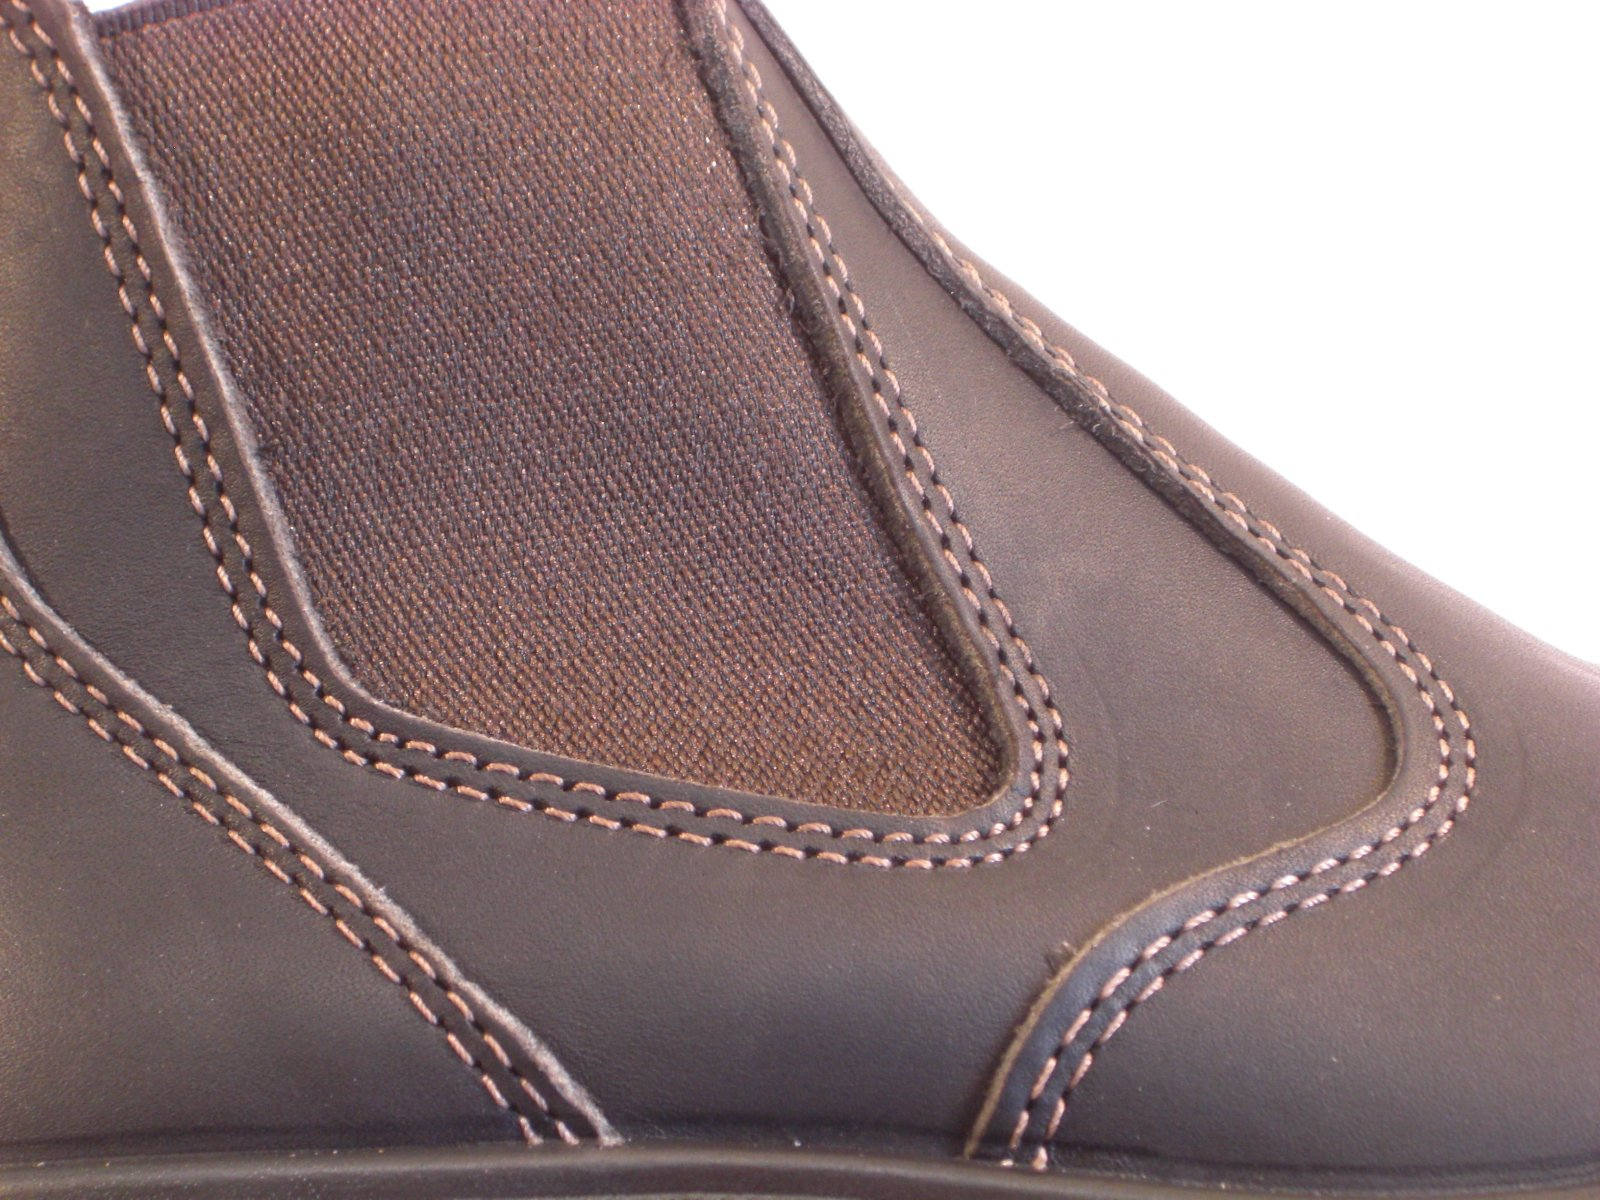 8de3268115d RedbacK Men's Safety Bobcat USBOK Elastic Sided Steel Toe Dark Brown ...